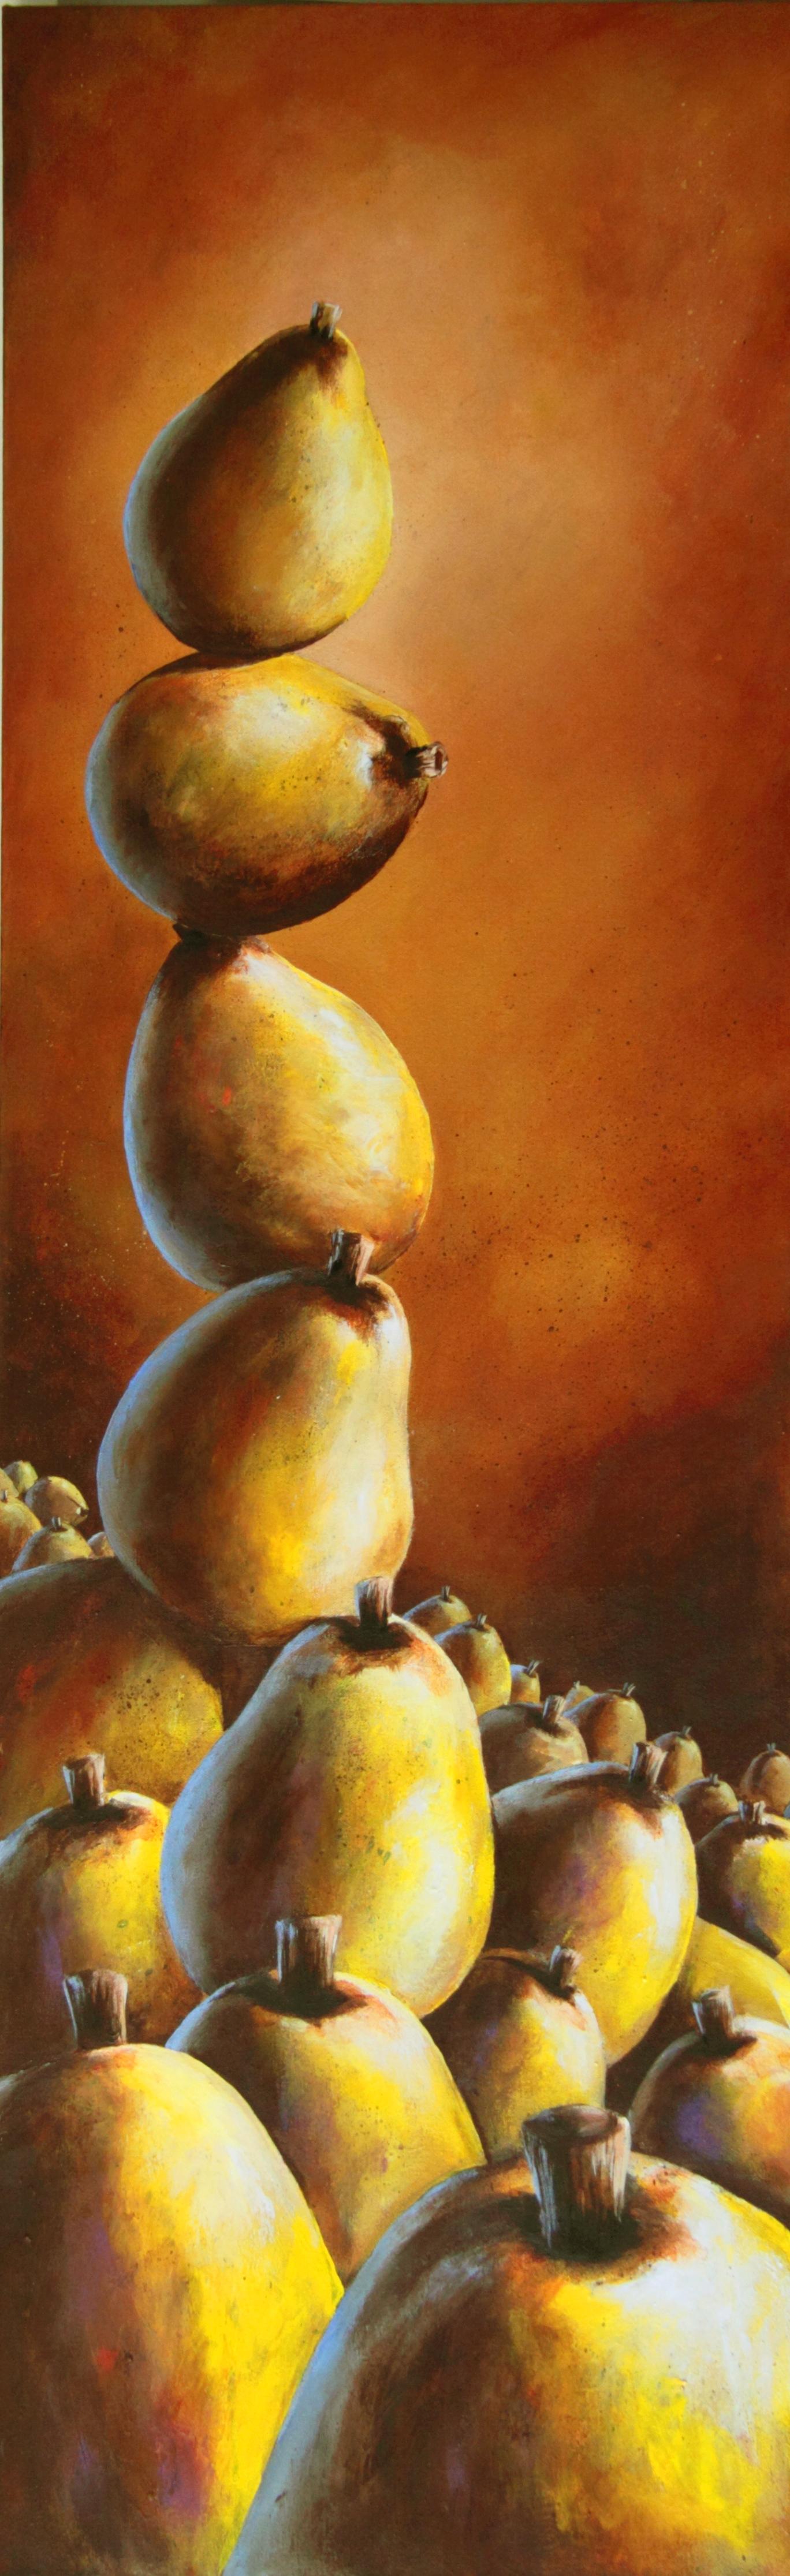 bill_higginson_balancing act-surrealism_painting-acrylic-painting-pears-fruit-canvas